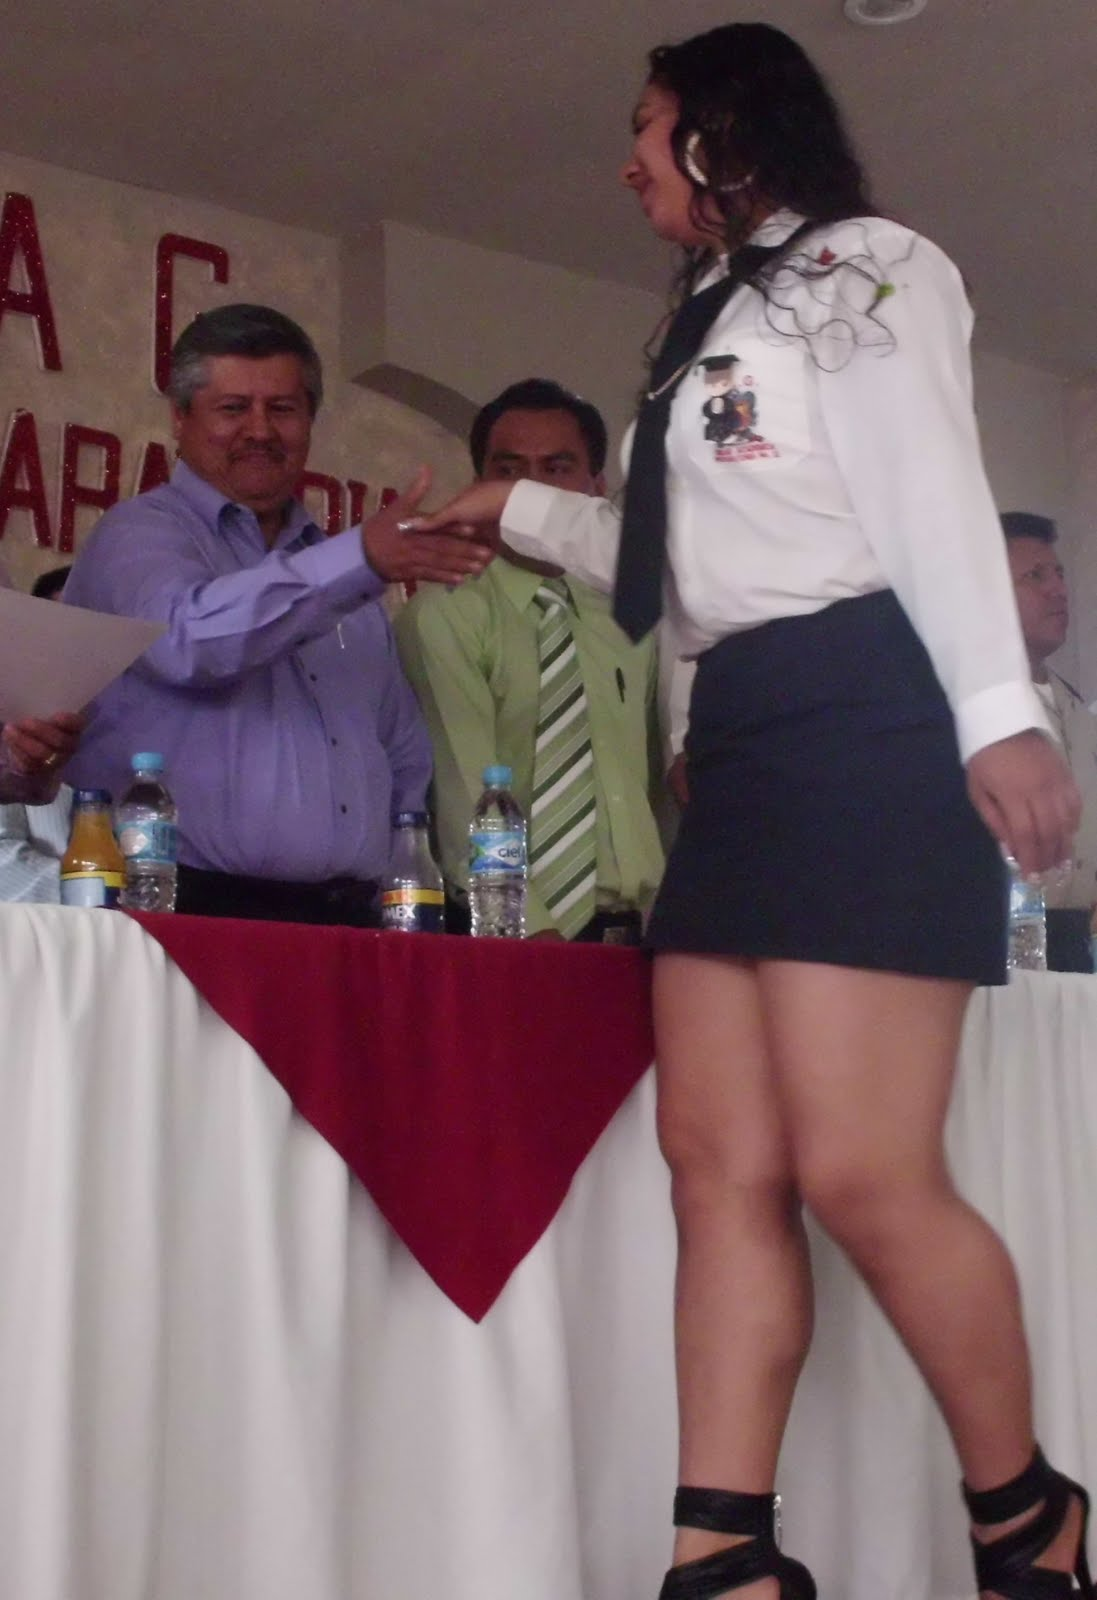 la jose lesbian personals I love animal i'm old school so i don't txt i rather talk on the phone n love corridos like chalino carlos y jose la vida loca i am a recently.